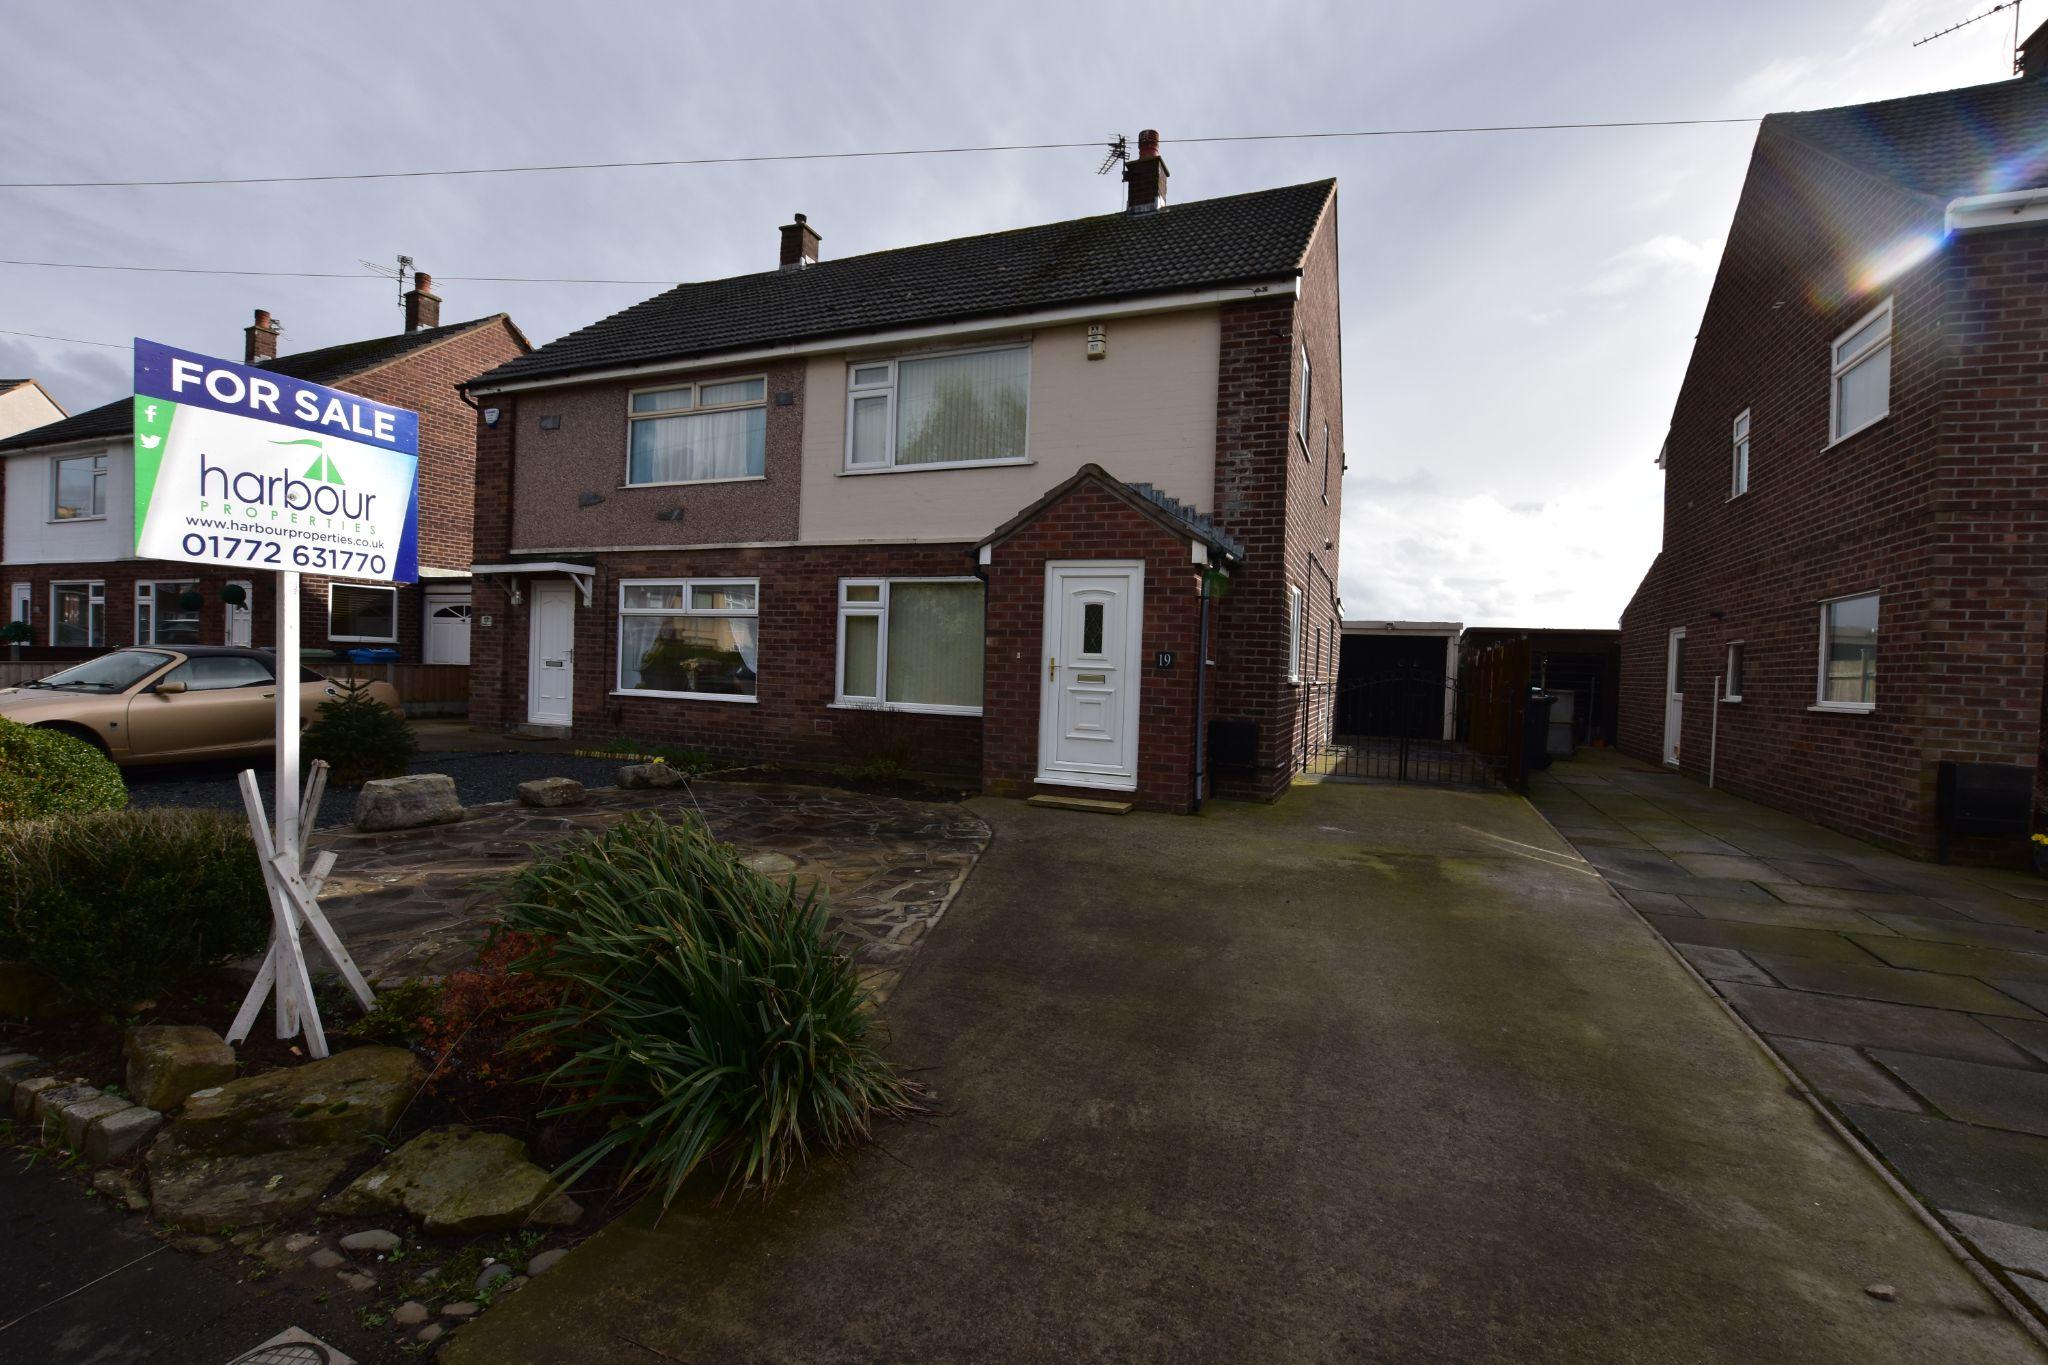 3 bedroom semi-detached house Sold STC in Preston - Ribble Avenue